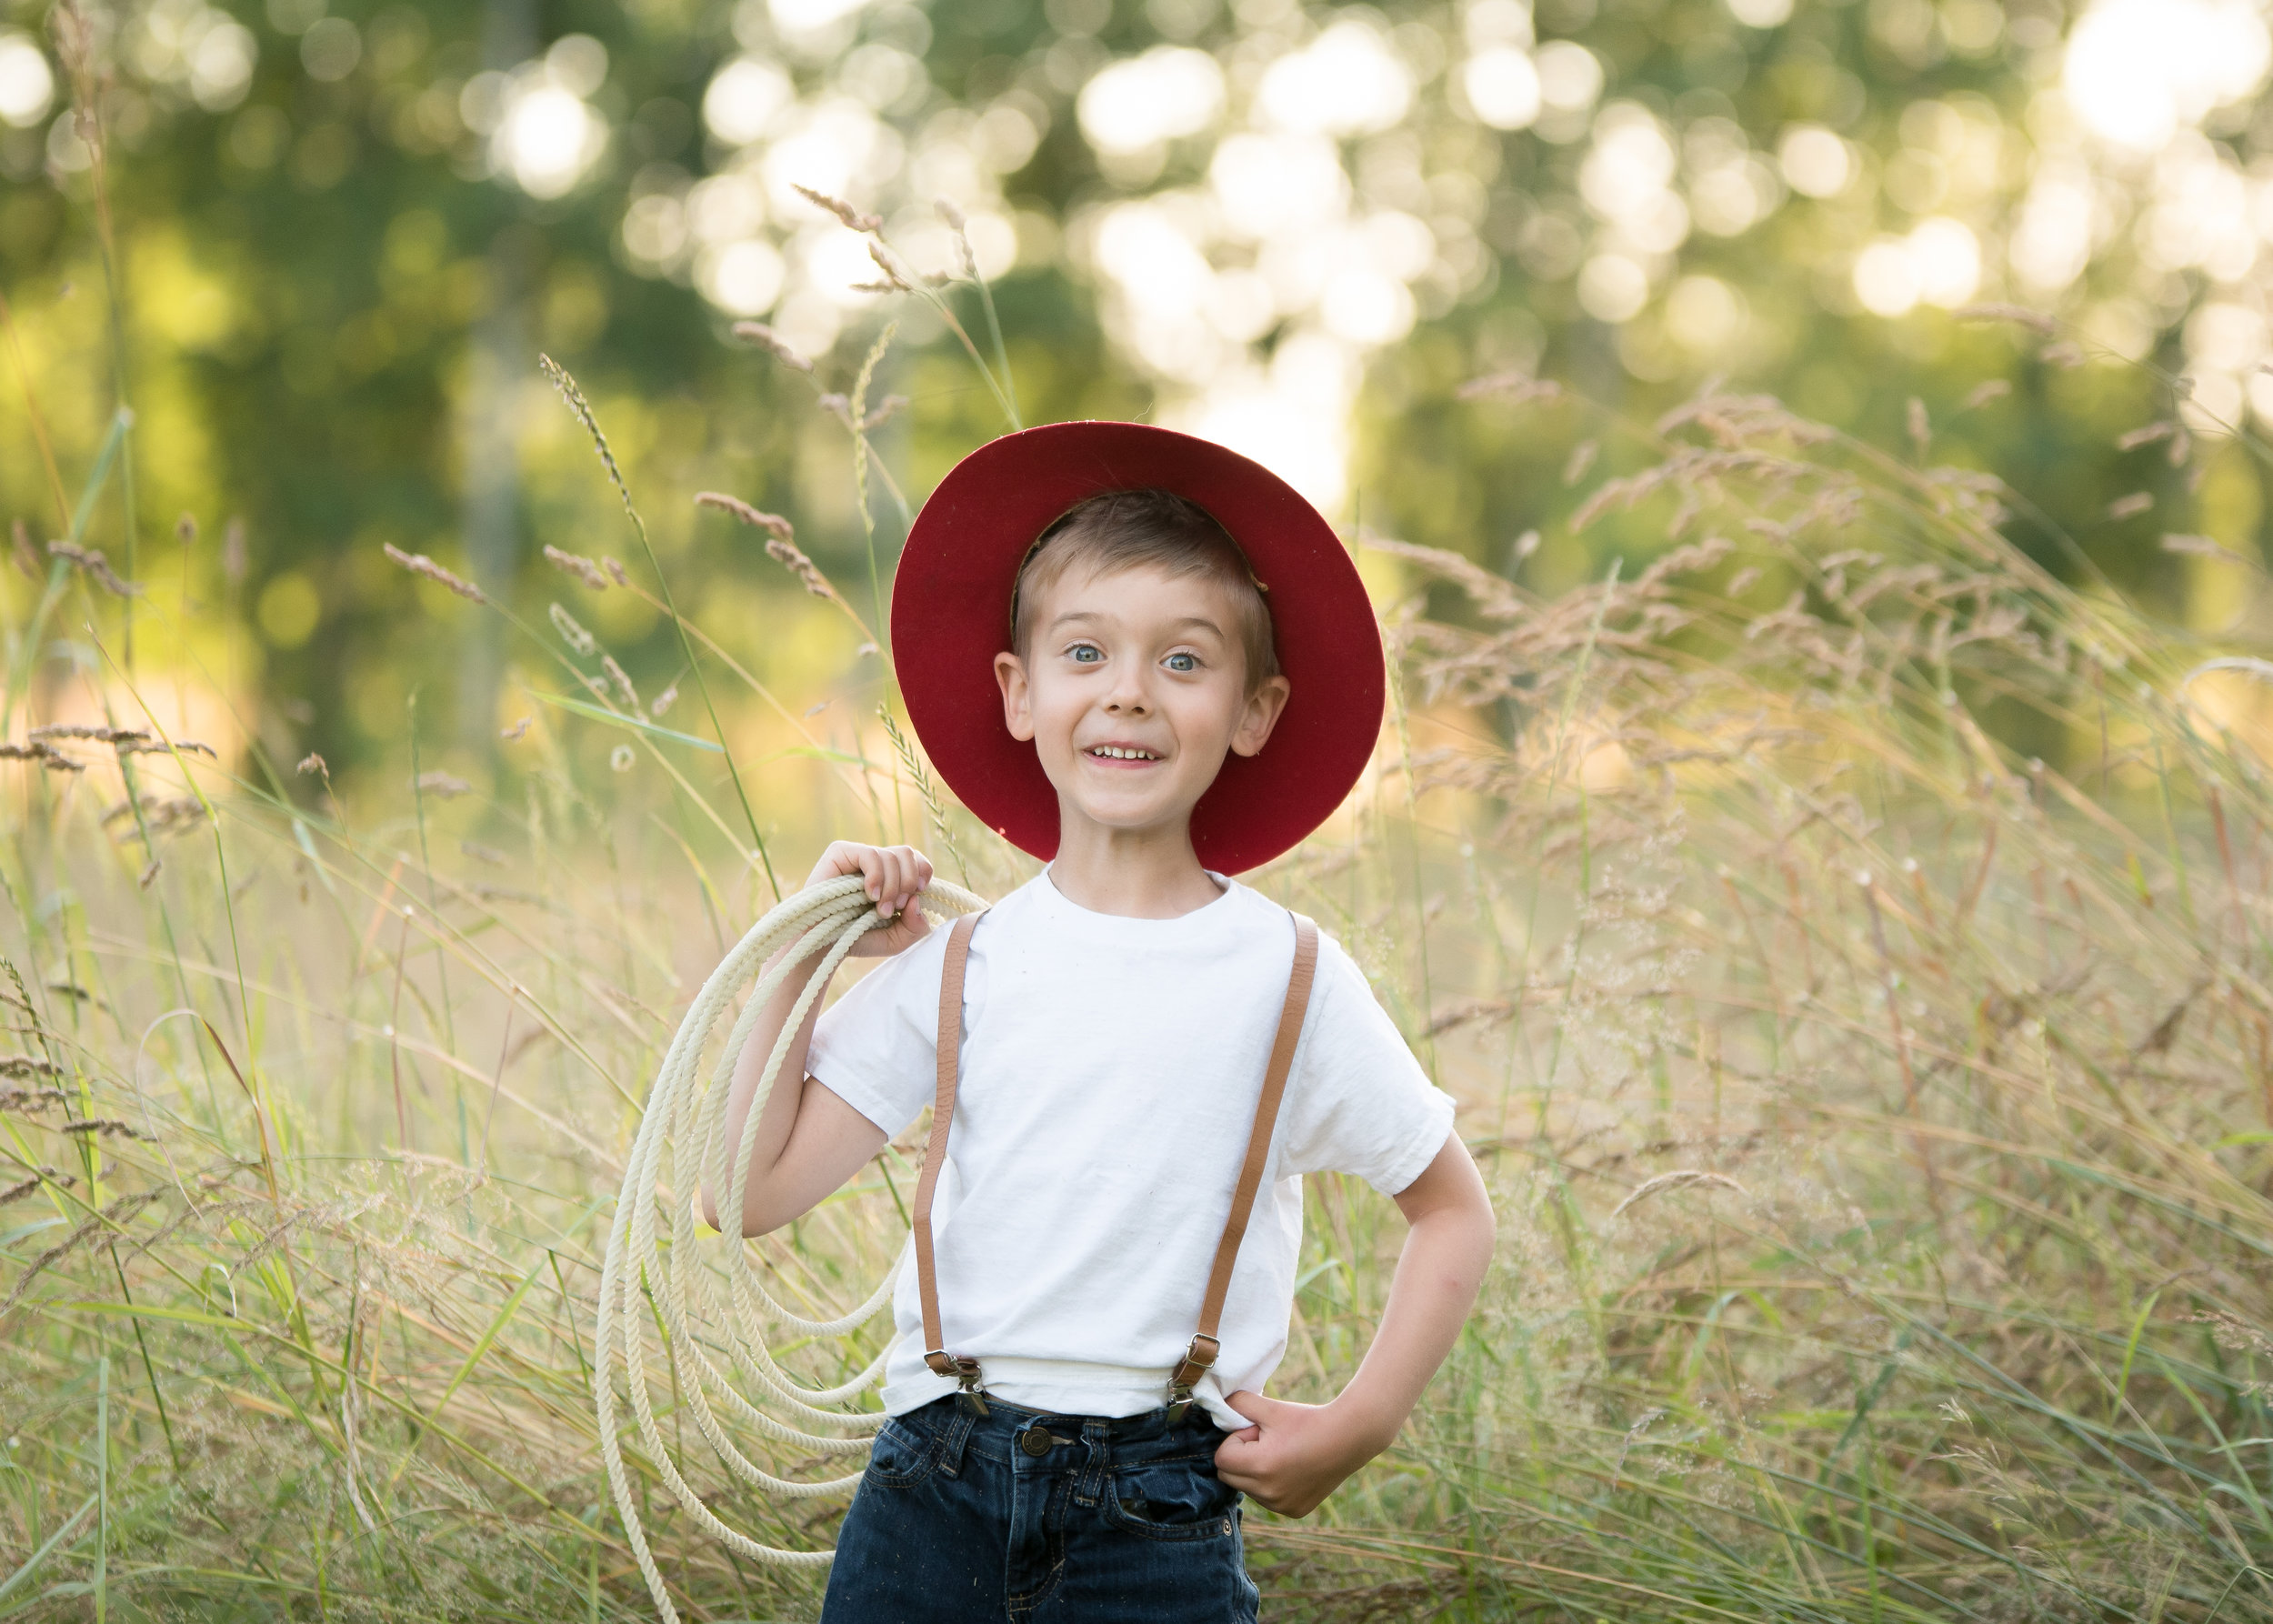 seattle children's photographer milestone photographer seattle child's portrait photographer children's photography